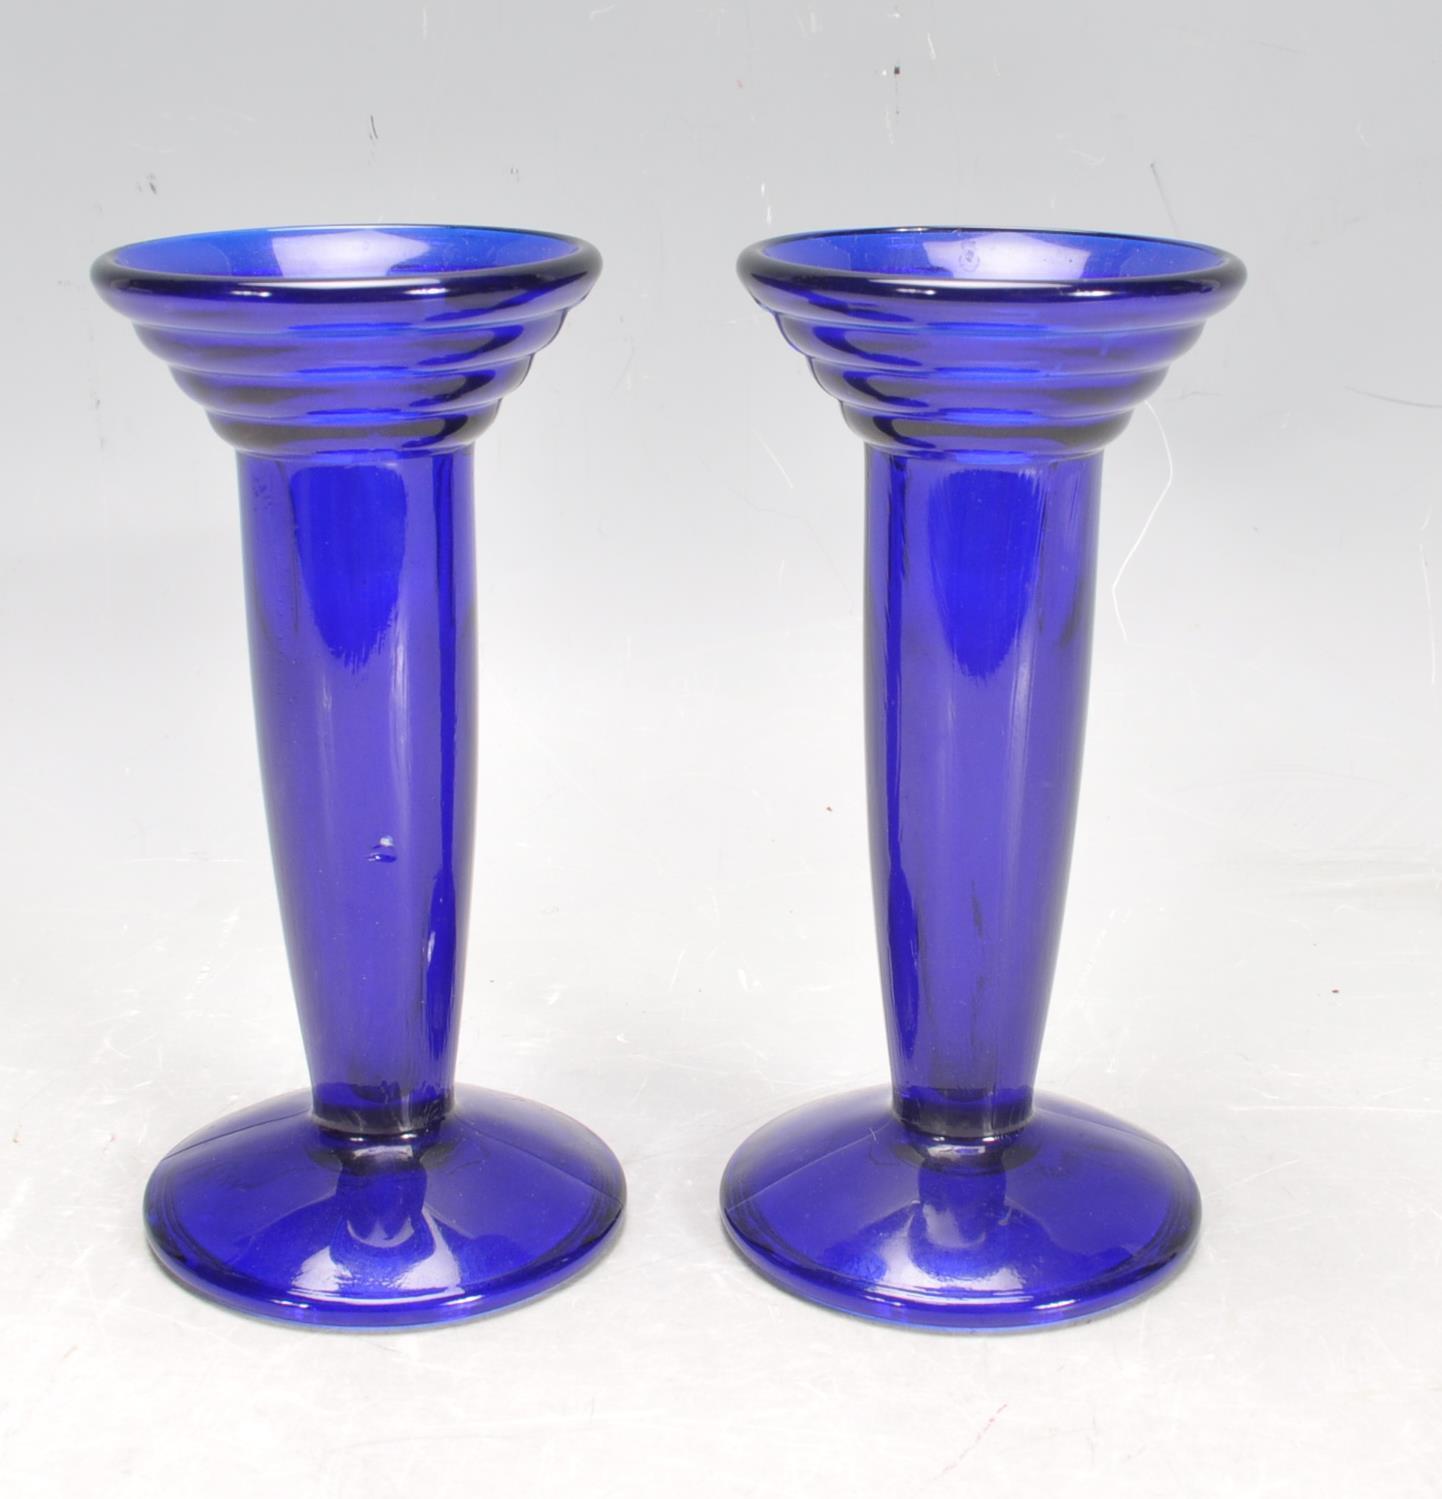 BRISTOL BLUE GLASS ORNAMENTS - Image 27 of 34